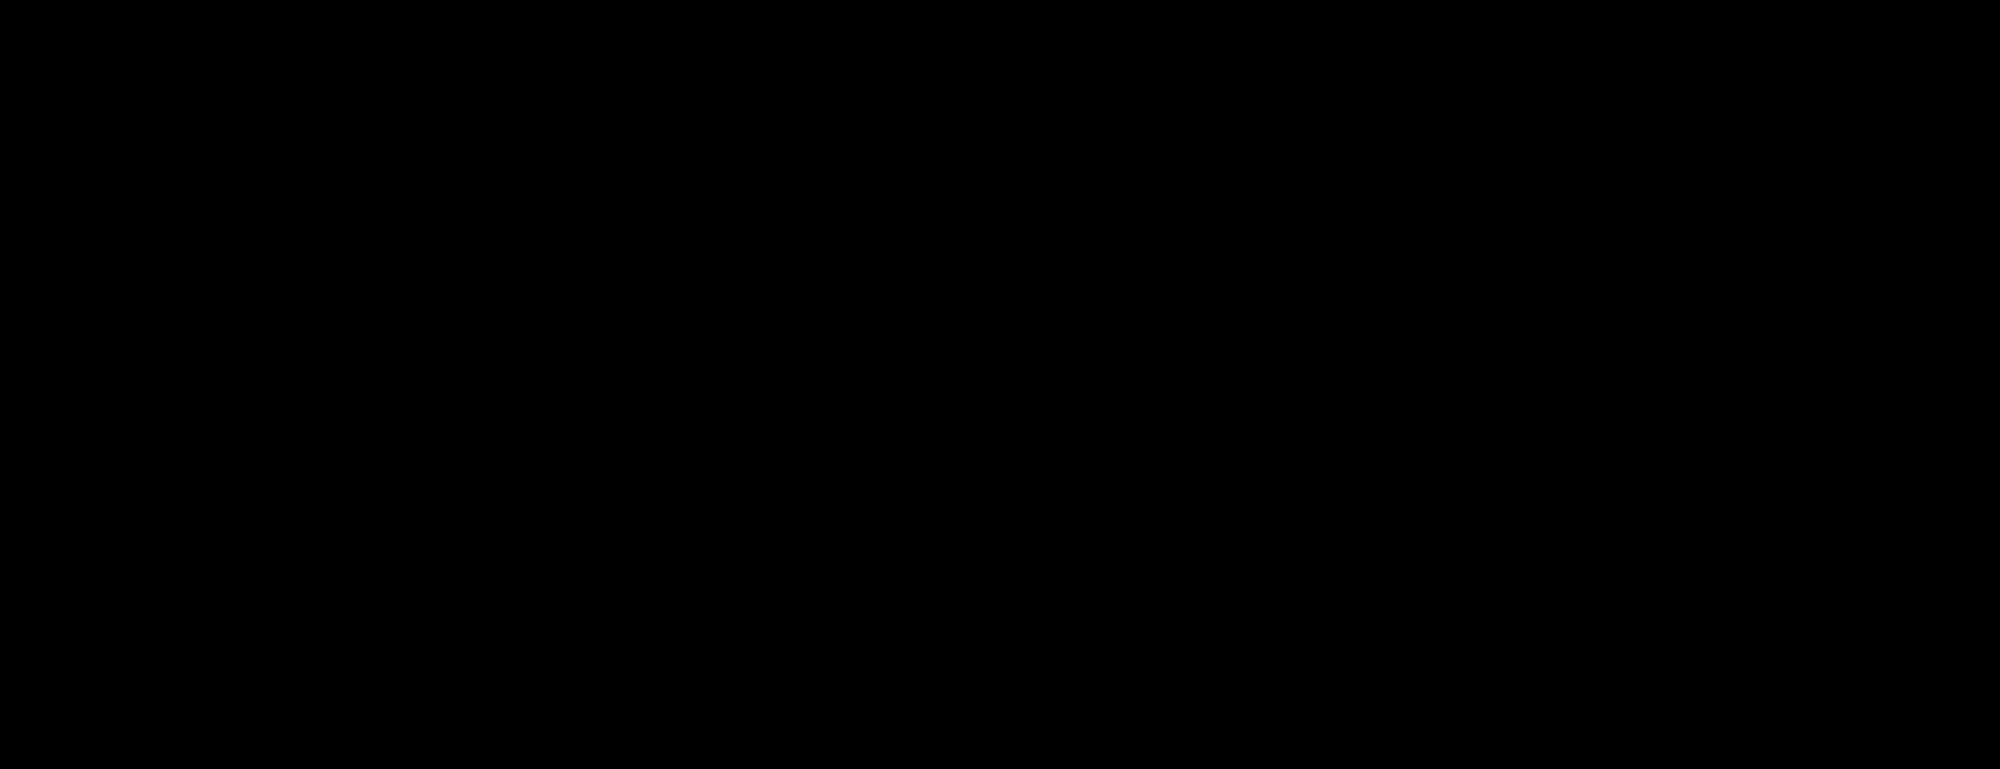 hight resolution of vernier caliper drawing